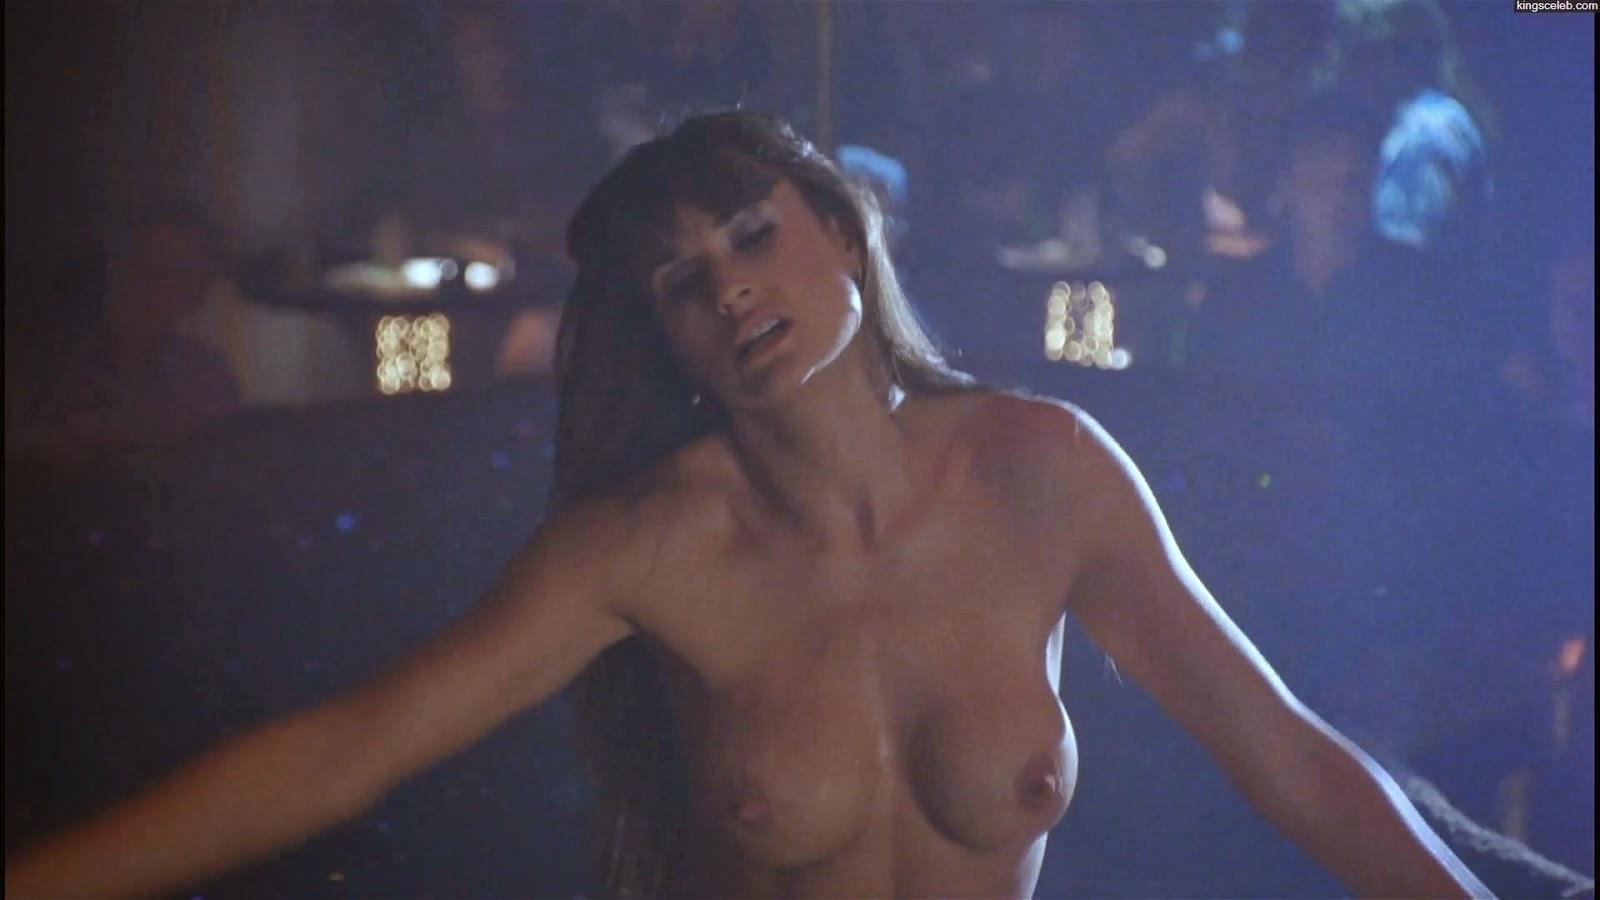 russkoe-porno-klassnoe-onlayn